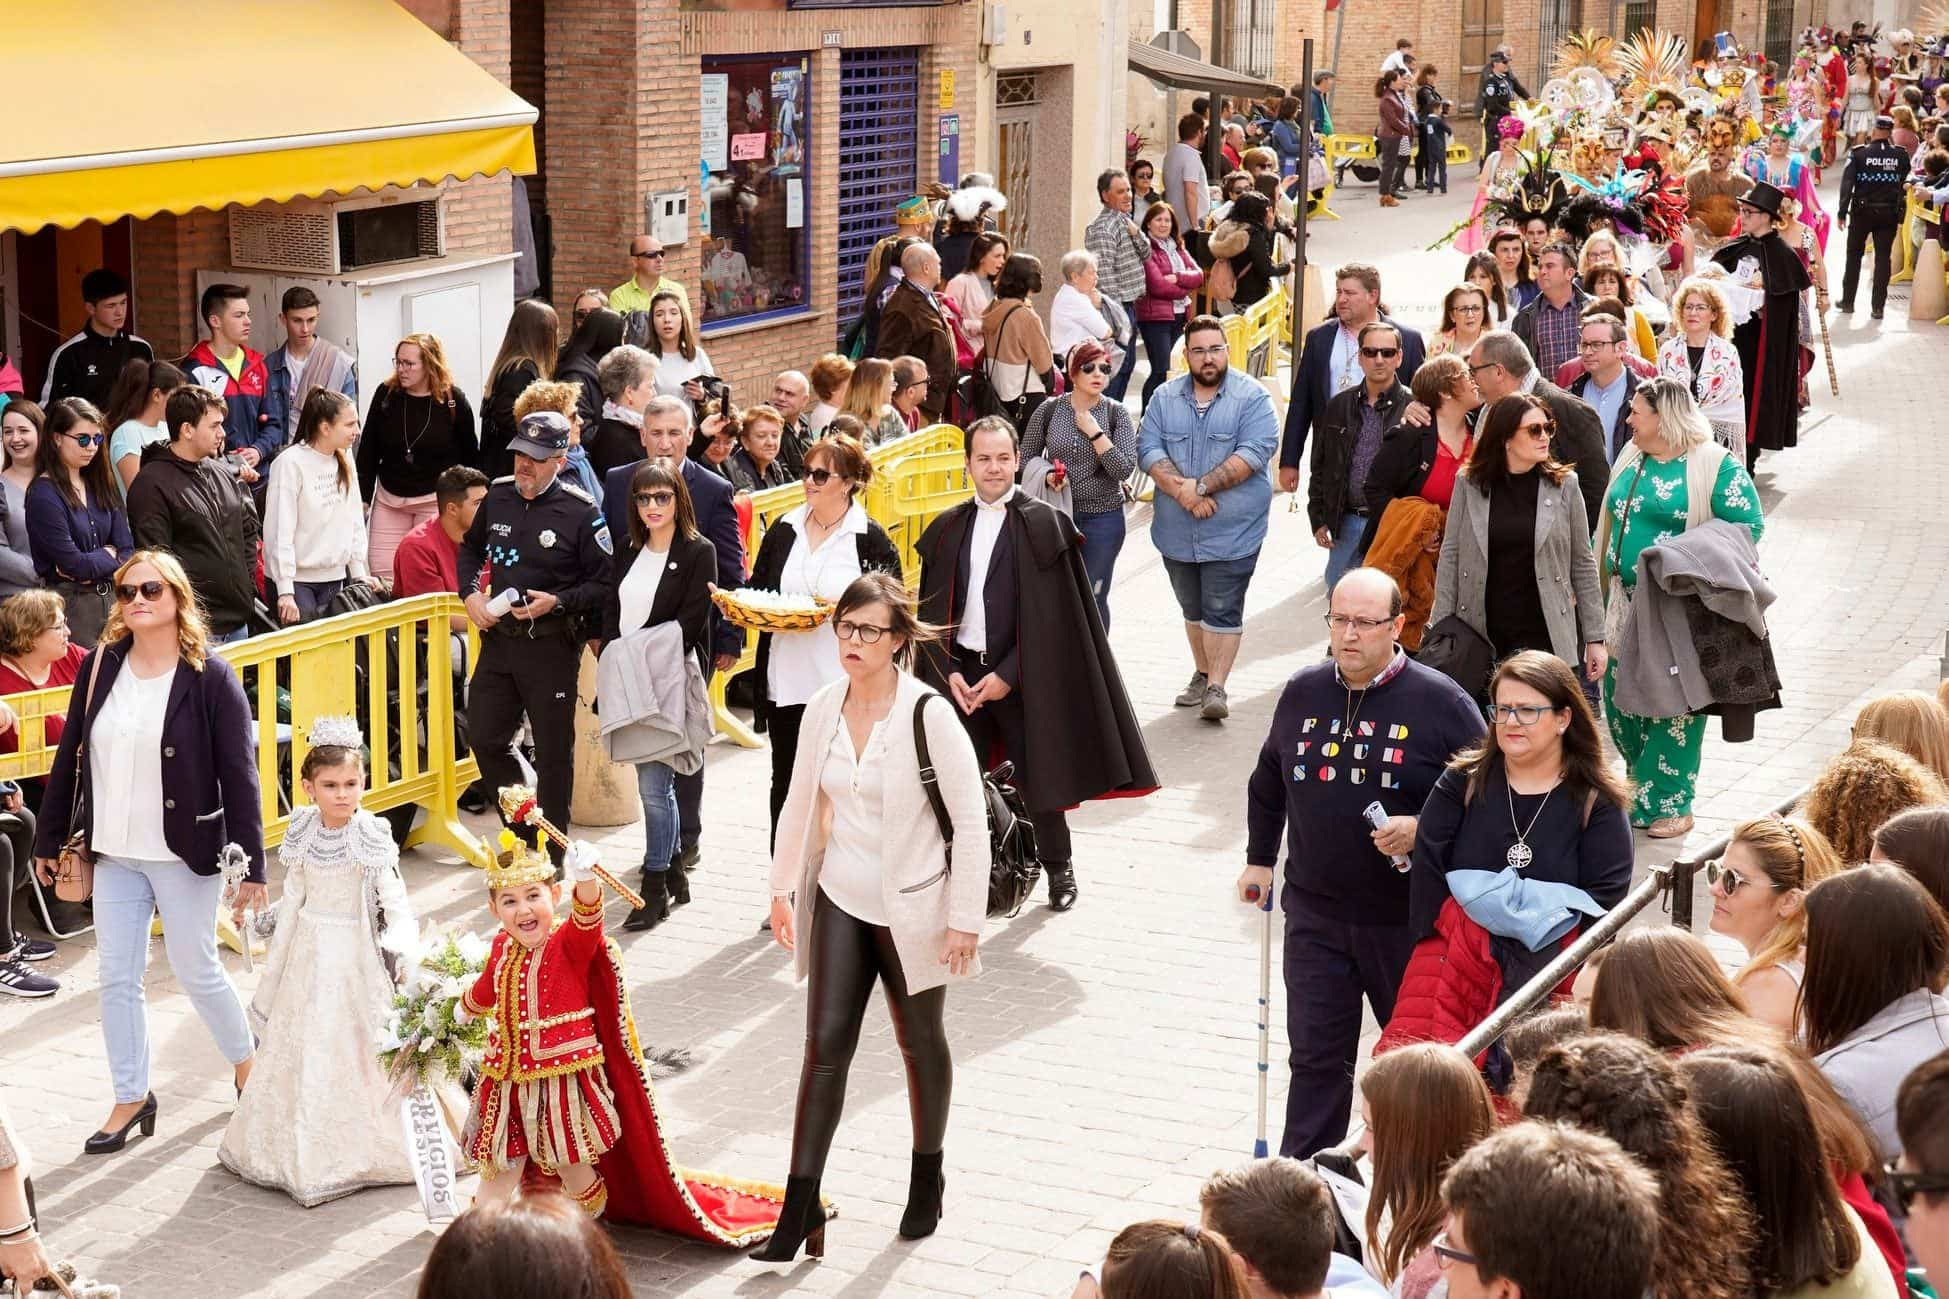 Carnaval de herencia 2020 ofertorio 163 - Selección de fotografías del Ofertorio del Carnaval de Herencia